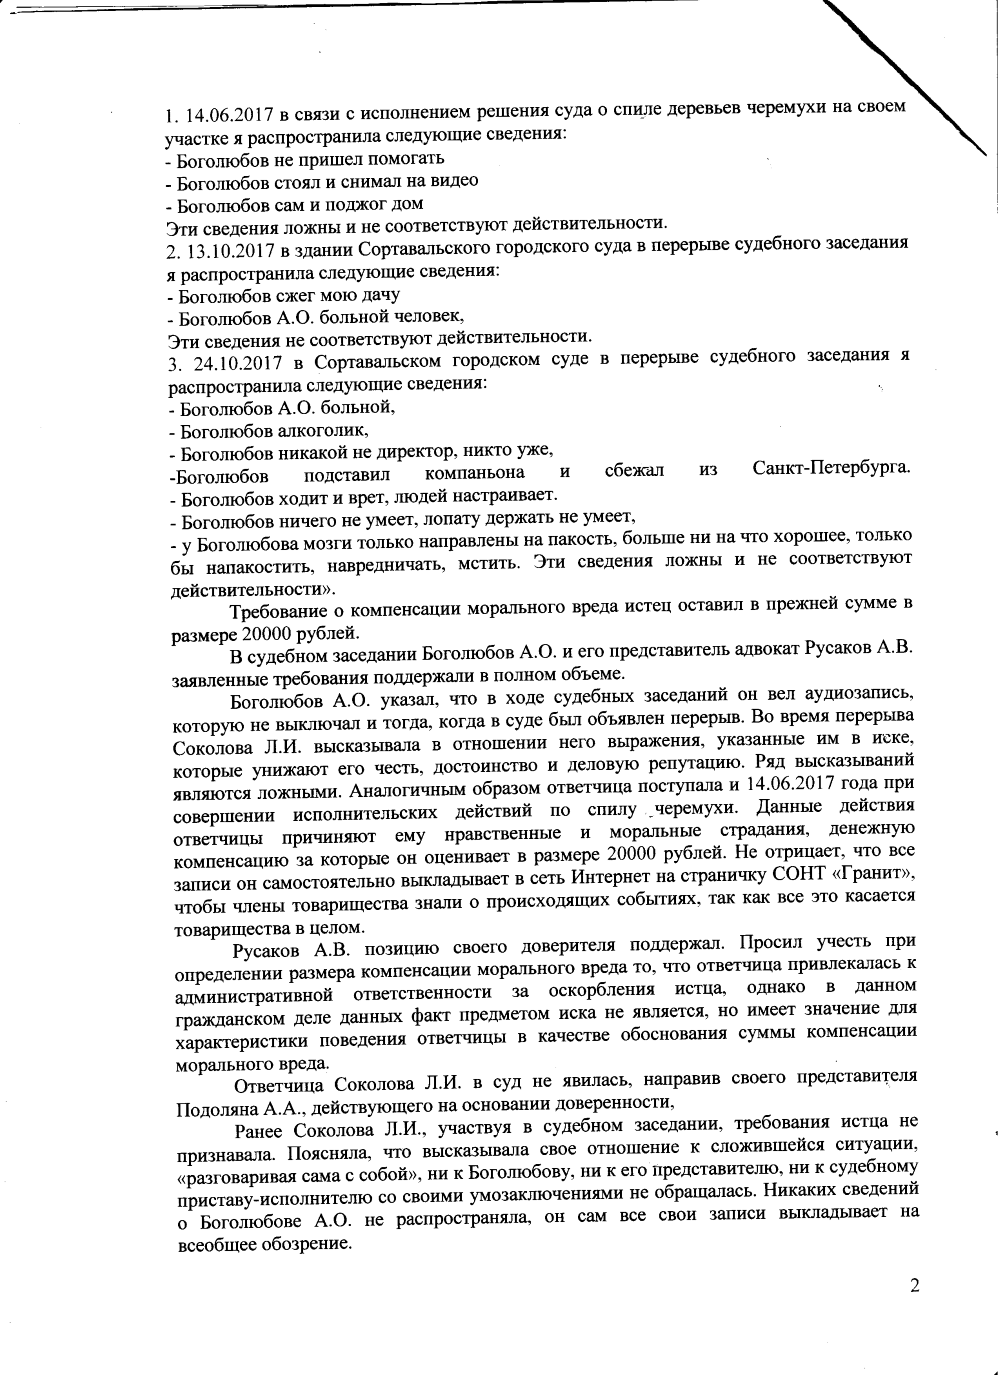 https://sontgranit.ru/forum/img/sokol/20180209-решение-3.png